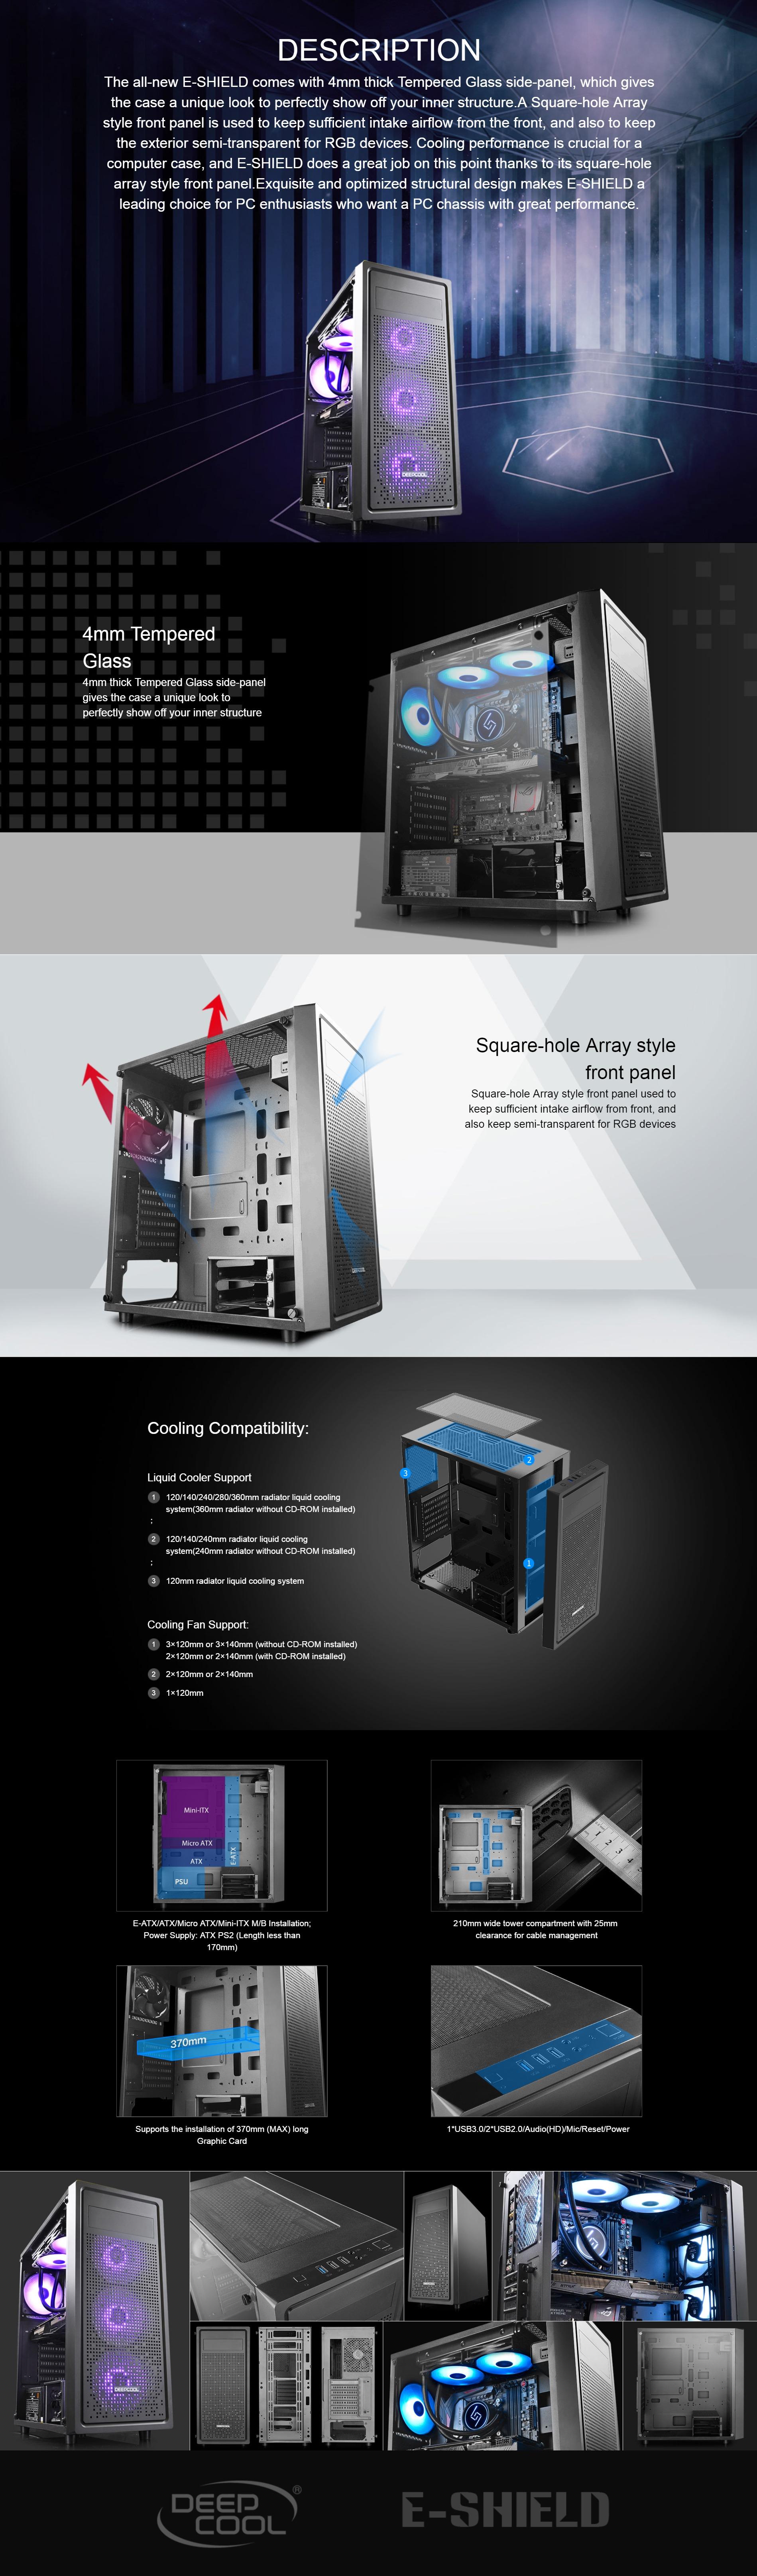 deepcool-black-e-shield-mid-tower-chassis-t01.jpg